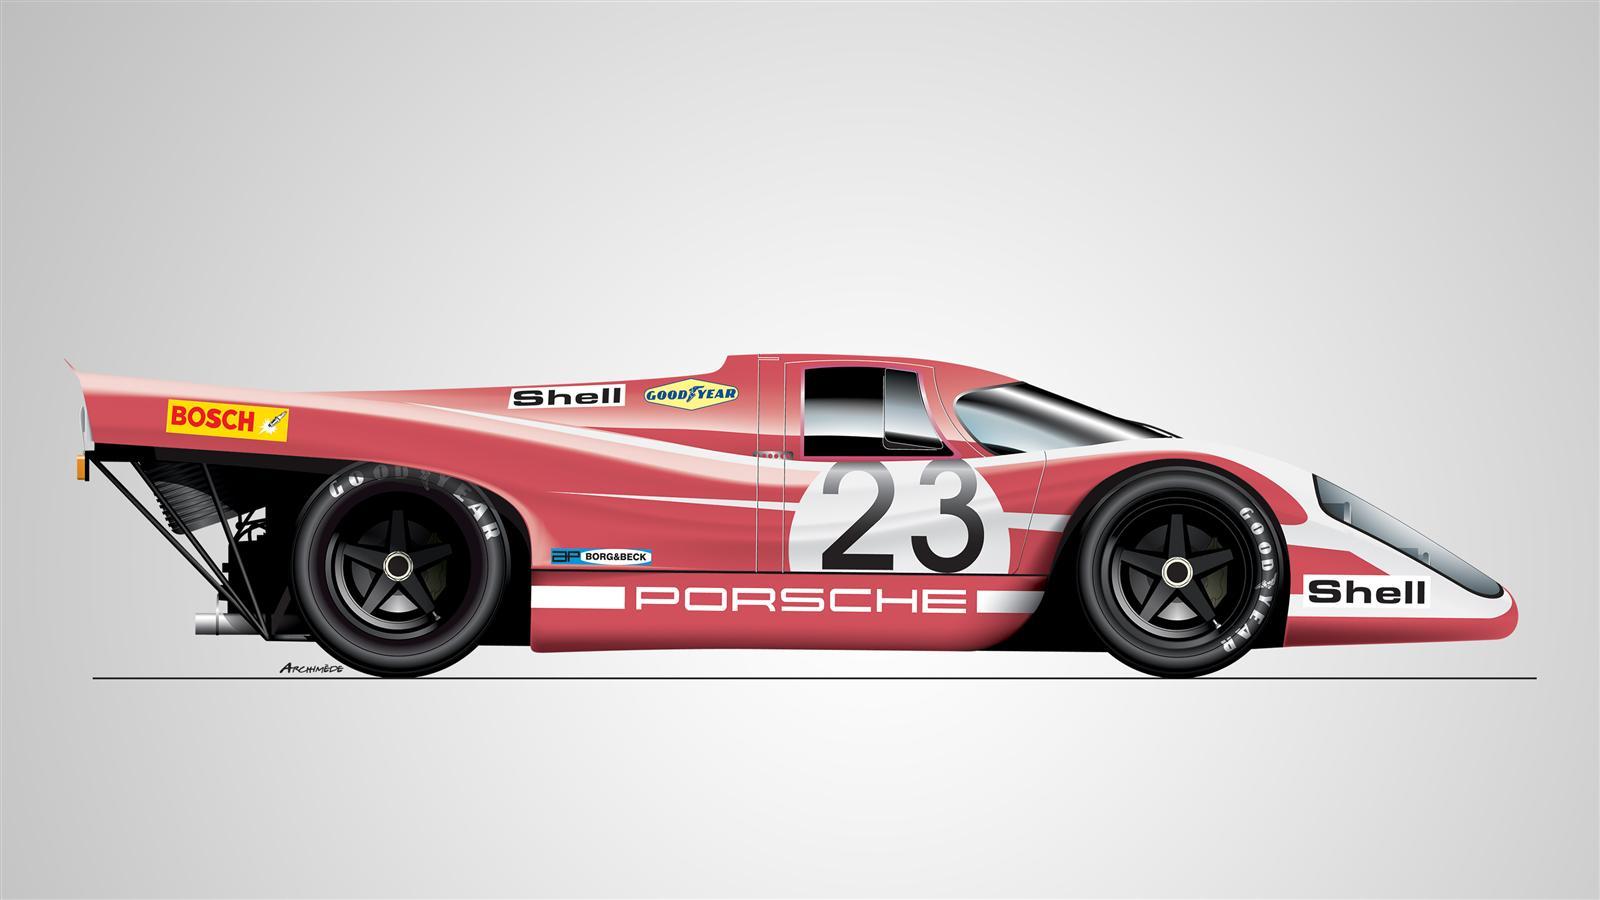 Porsche Le Mans 24 Hours Winner 1970 2017 Porsche Cars